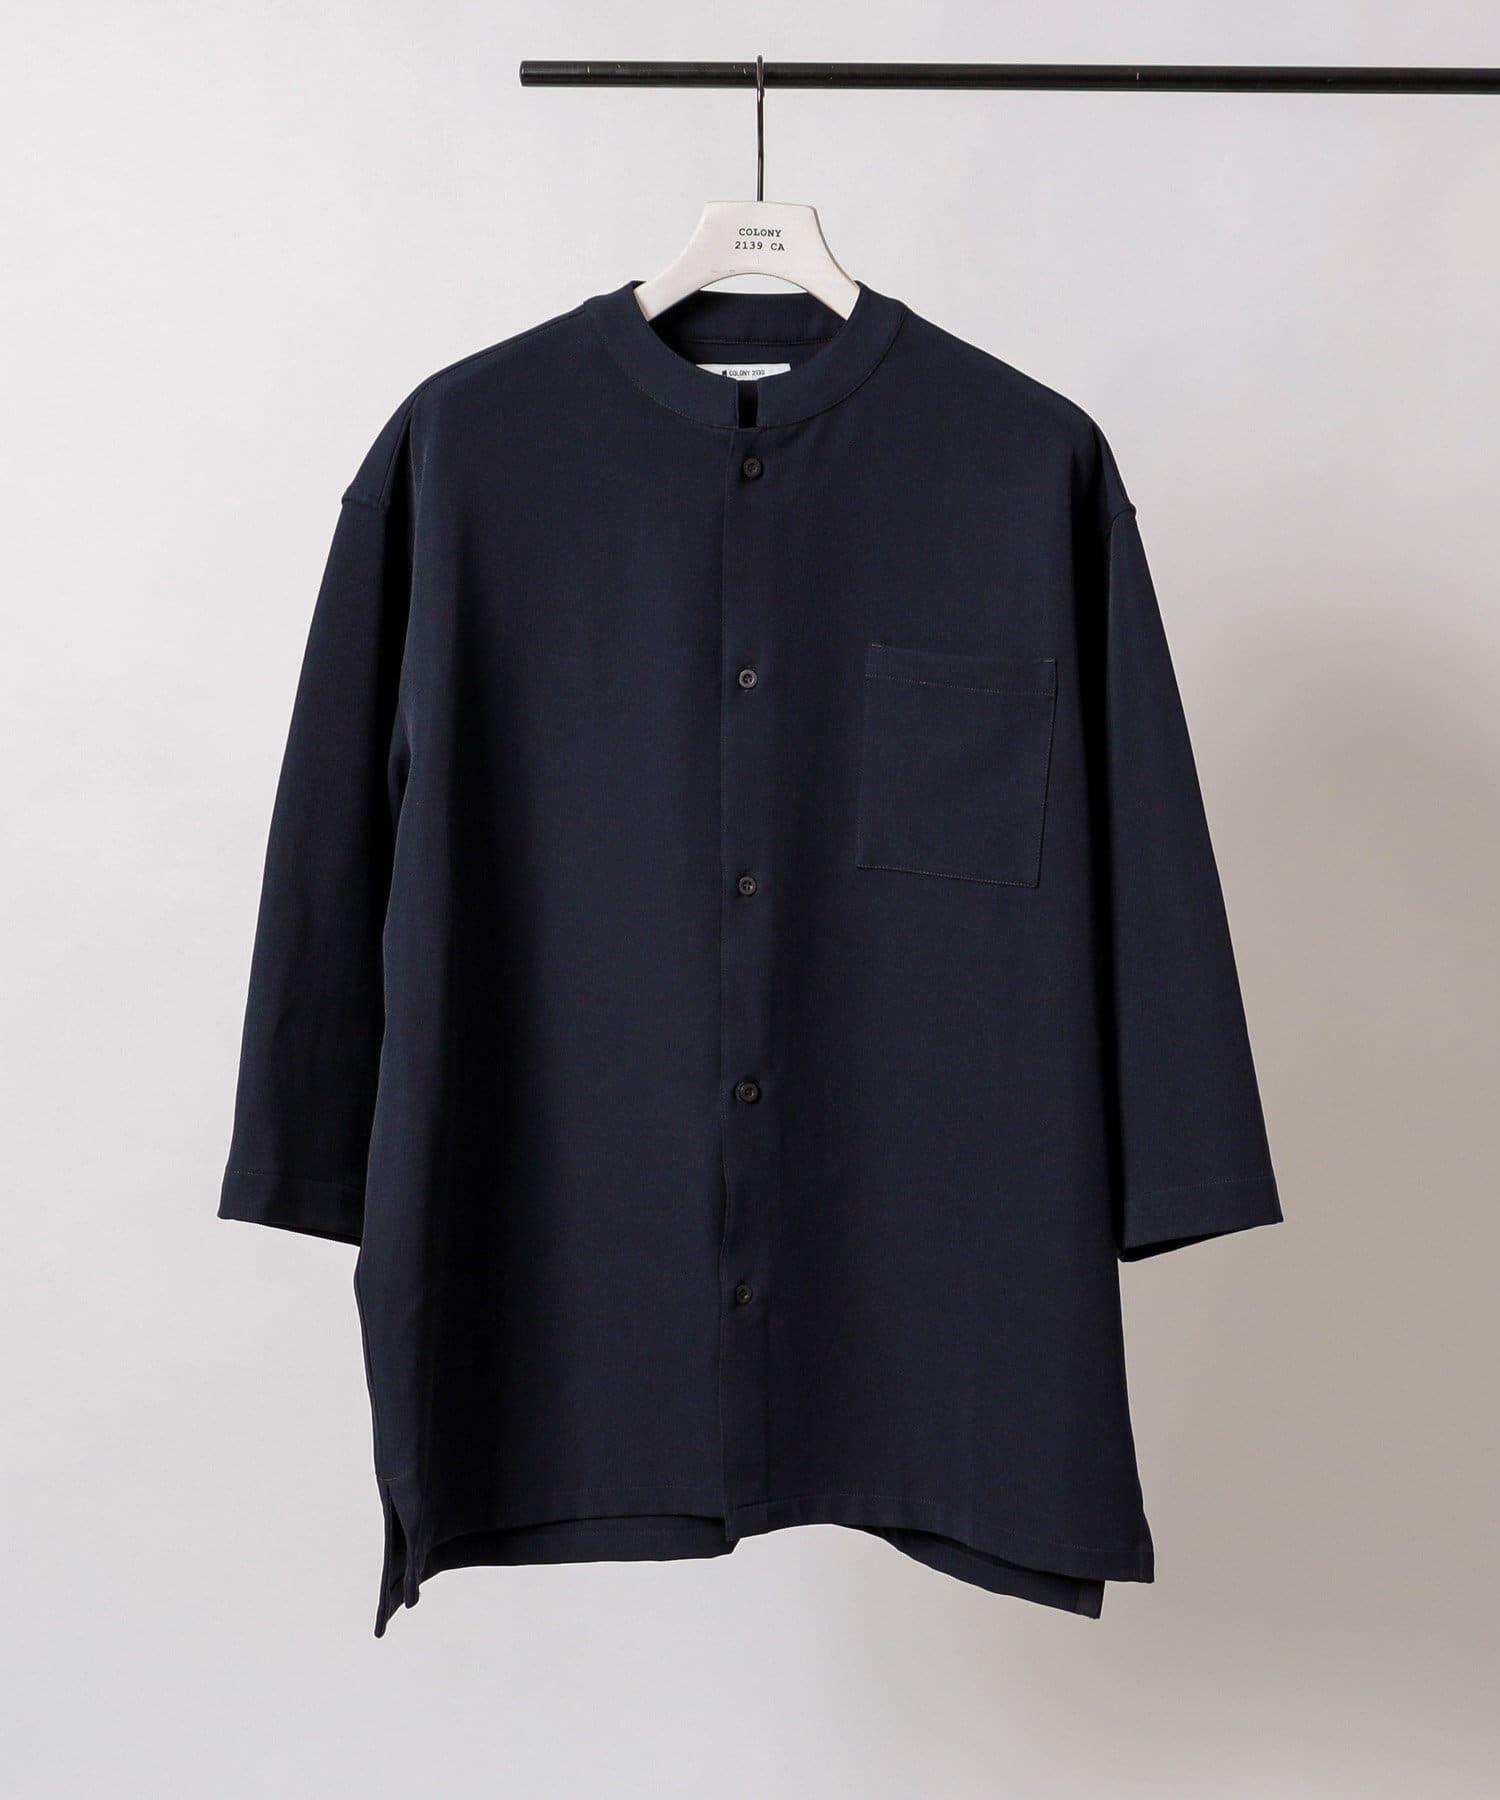 COLONY 2139(コロニー トゥーワンスリーナイン) ストレッチイージーケアスタンド8分袖シャツ※セットアップ対応